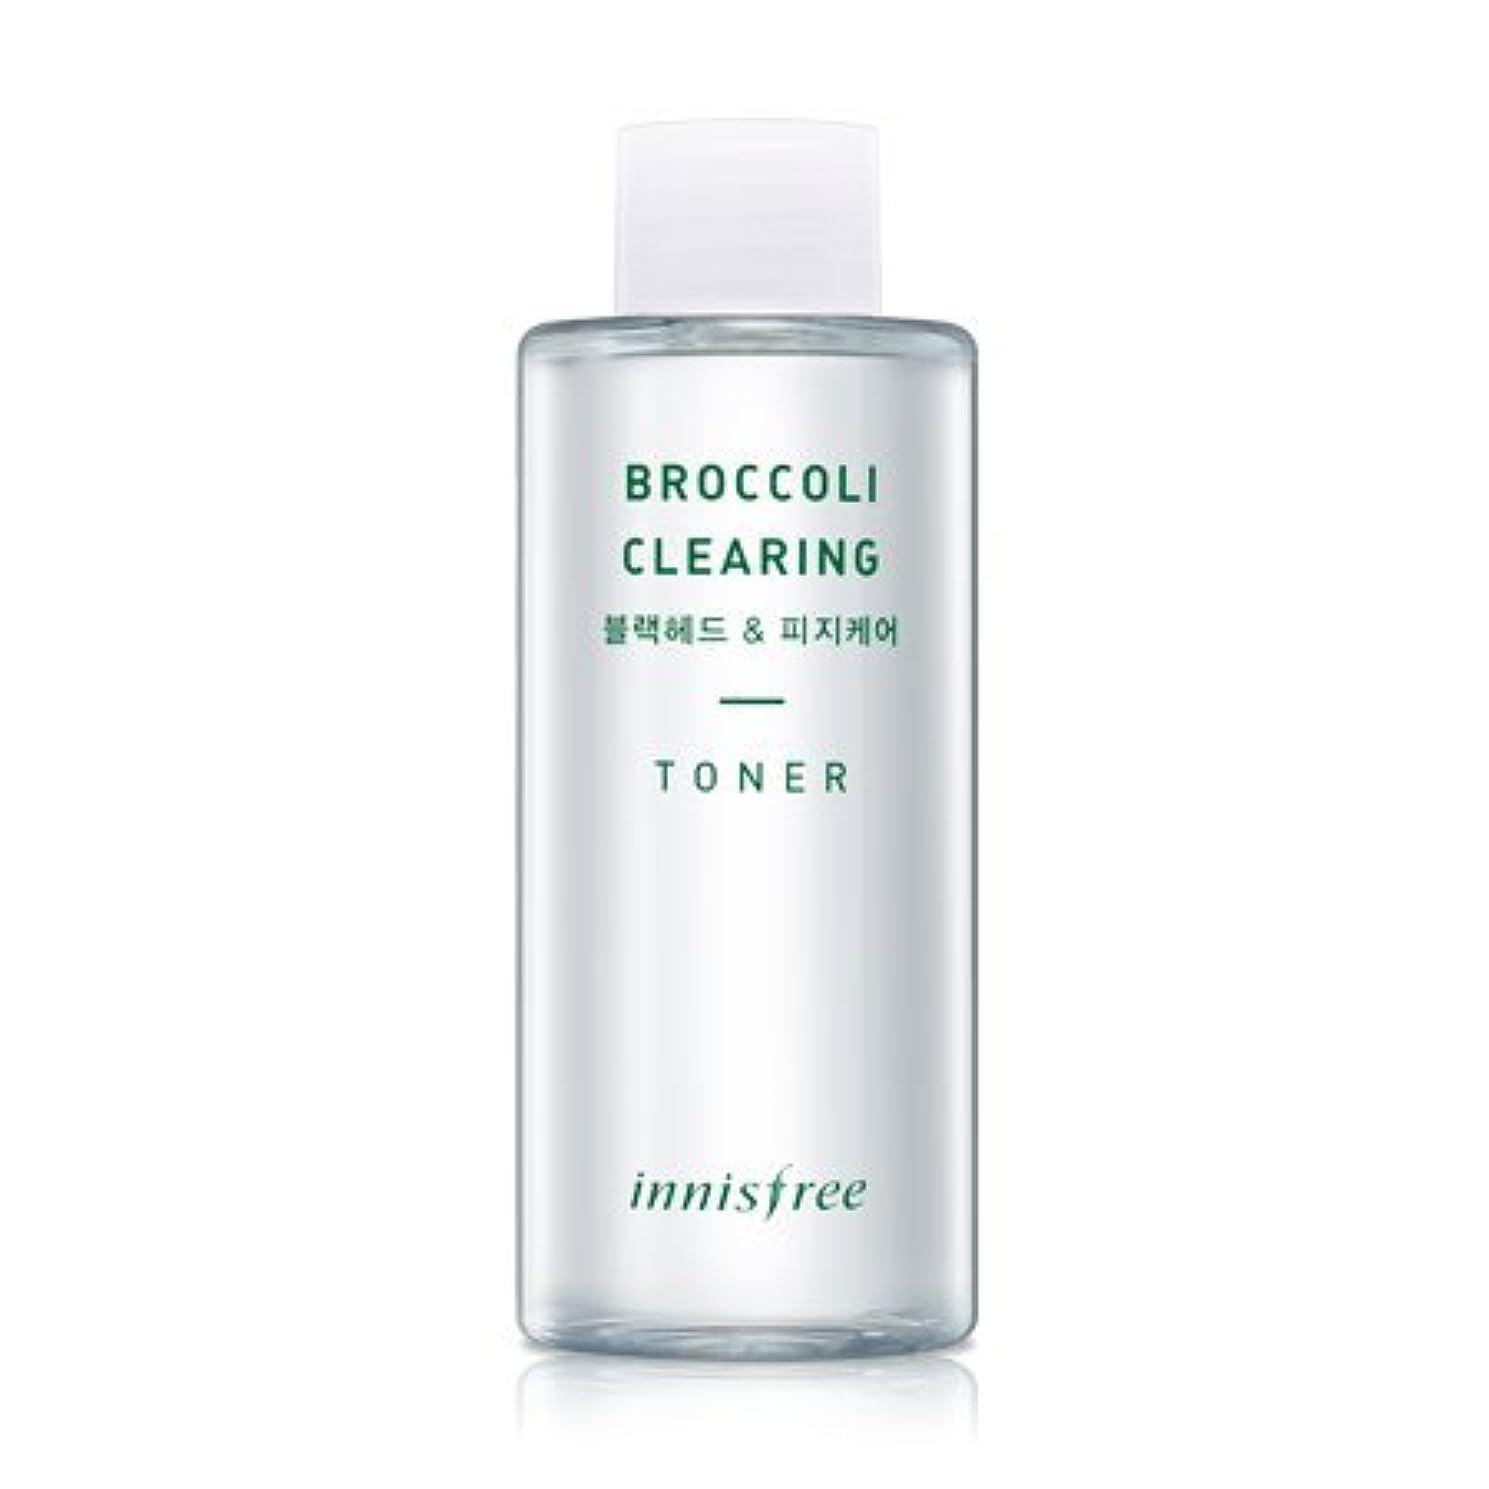 [innisfree(イニスフリー)] Super food_ Broccoli clearing toner (150ml) スーパーフード_ブロッコリー クリアリング?トナー [並行輸入品][海外直送品]